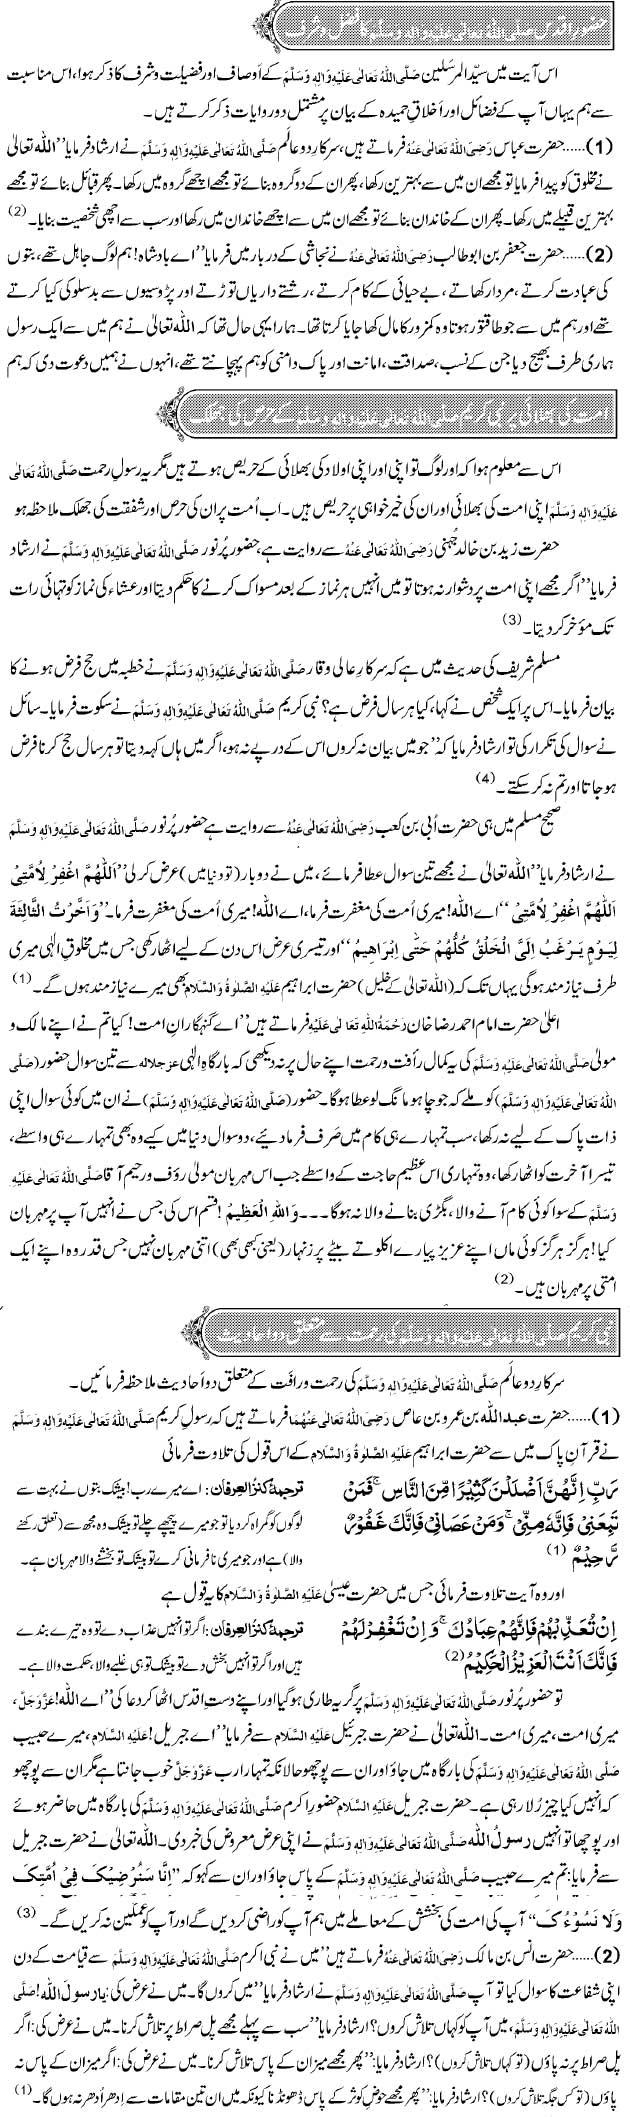 Ummat Ki Bhalai Per Huzoor (S.A.W) Ki Hiras